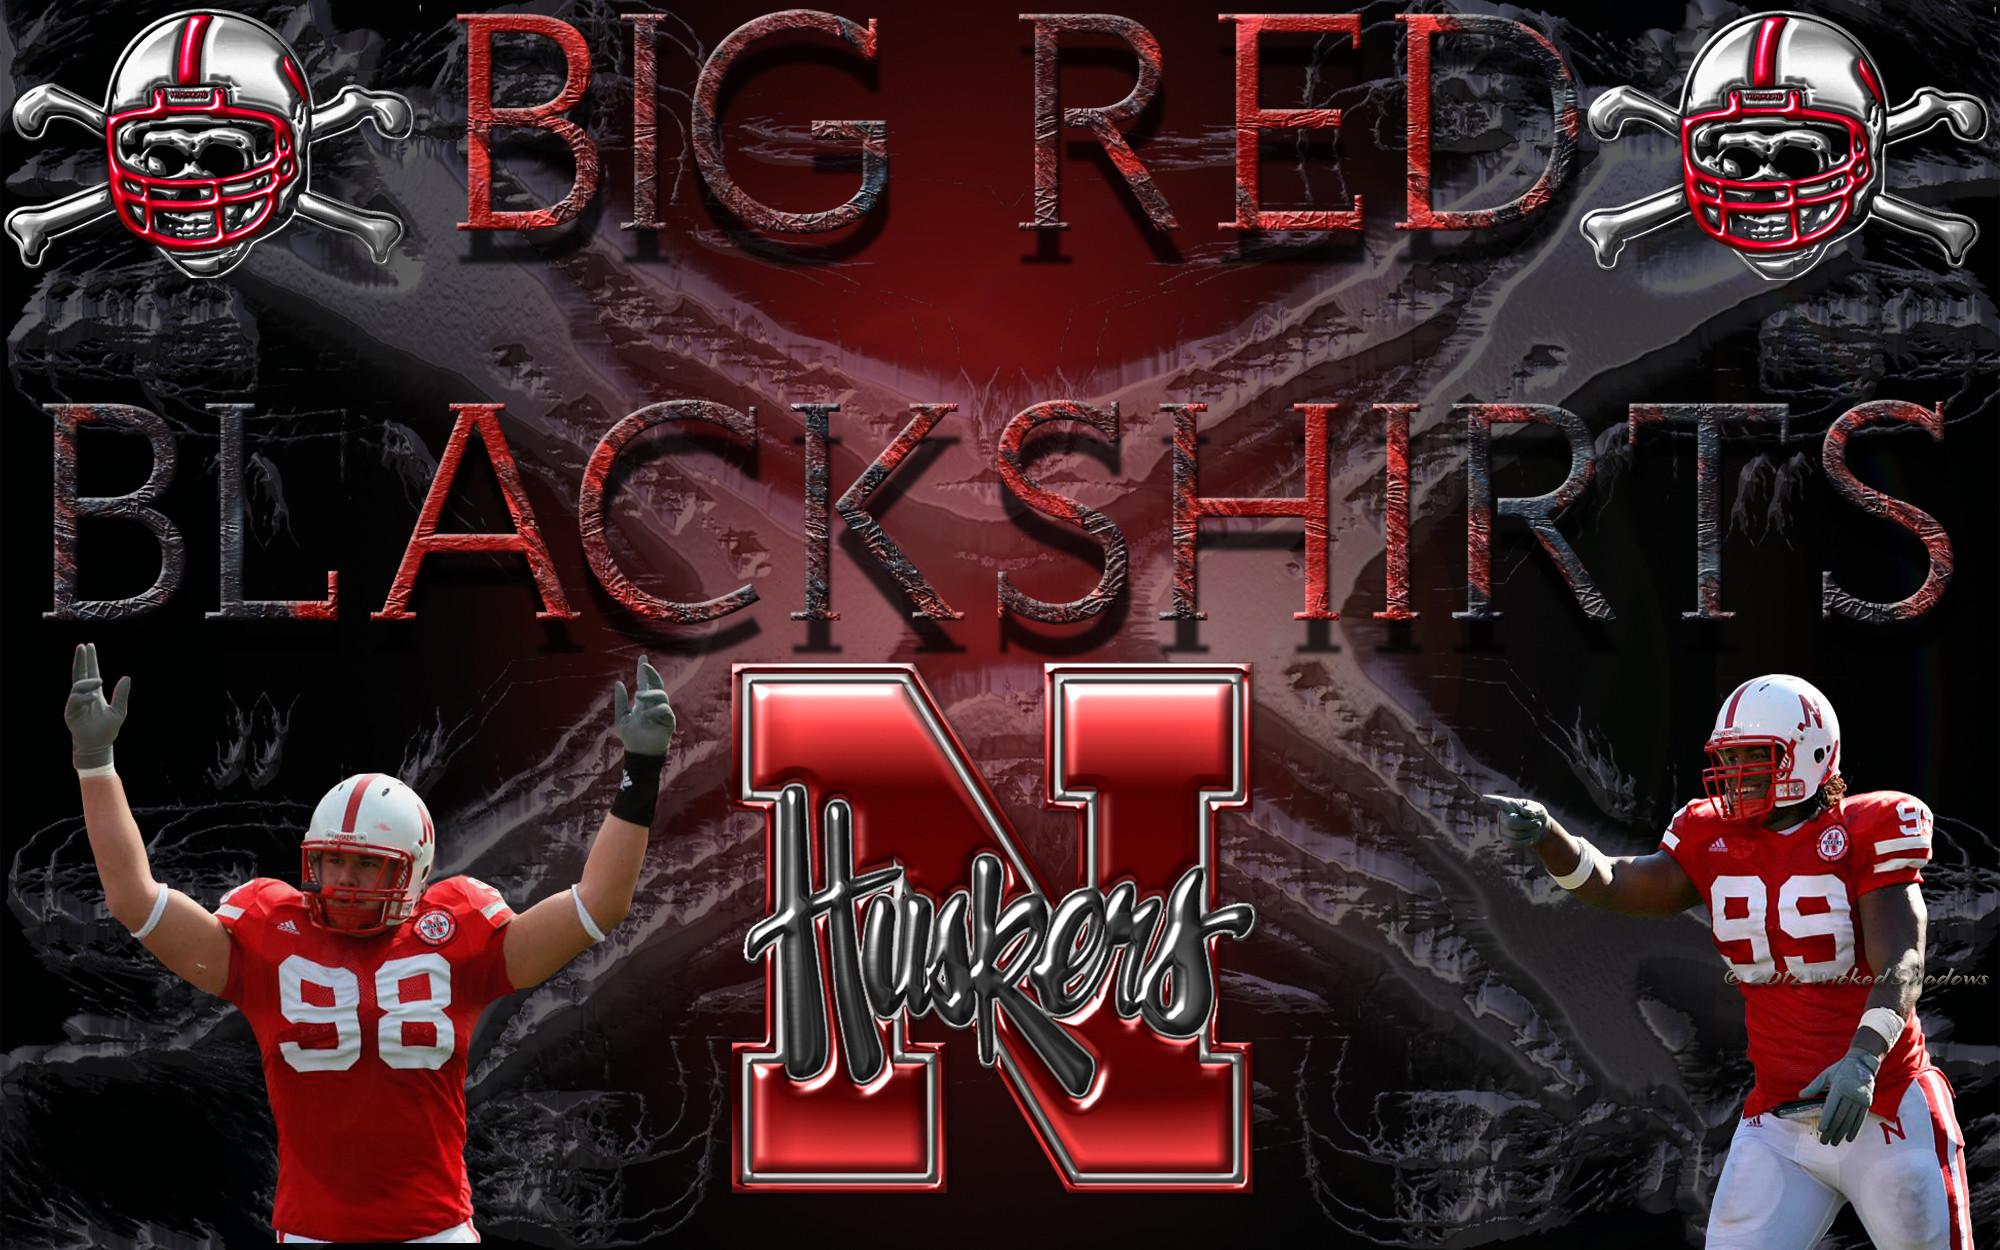 Huskers Big Red Blackshirts Wallpaper